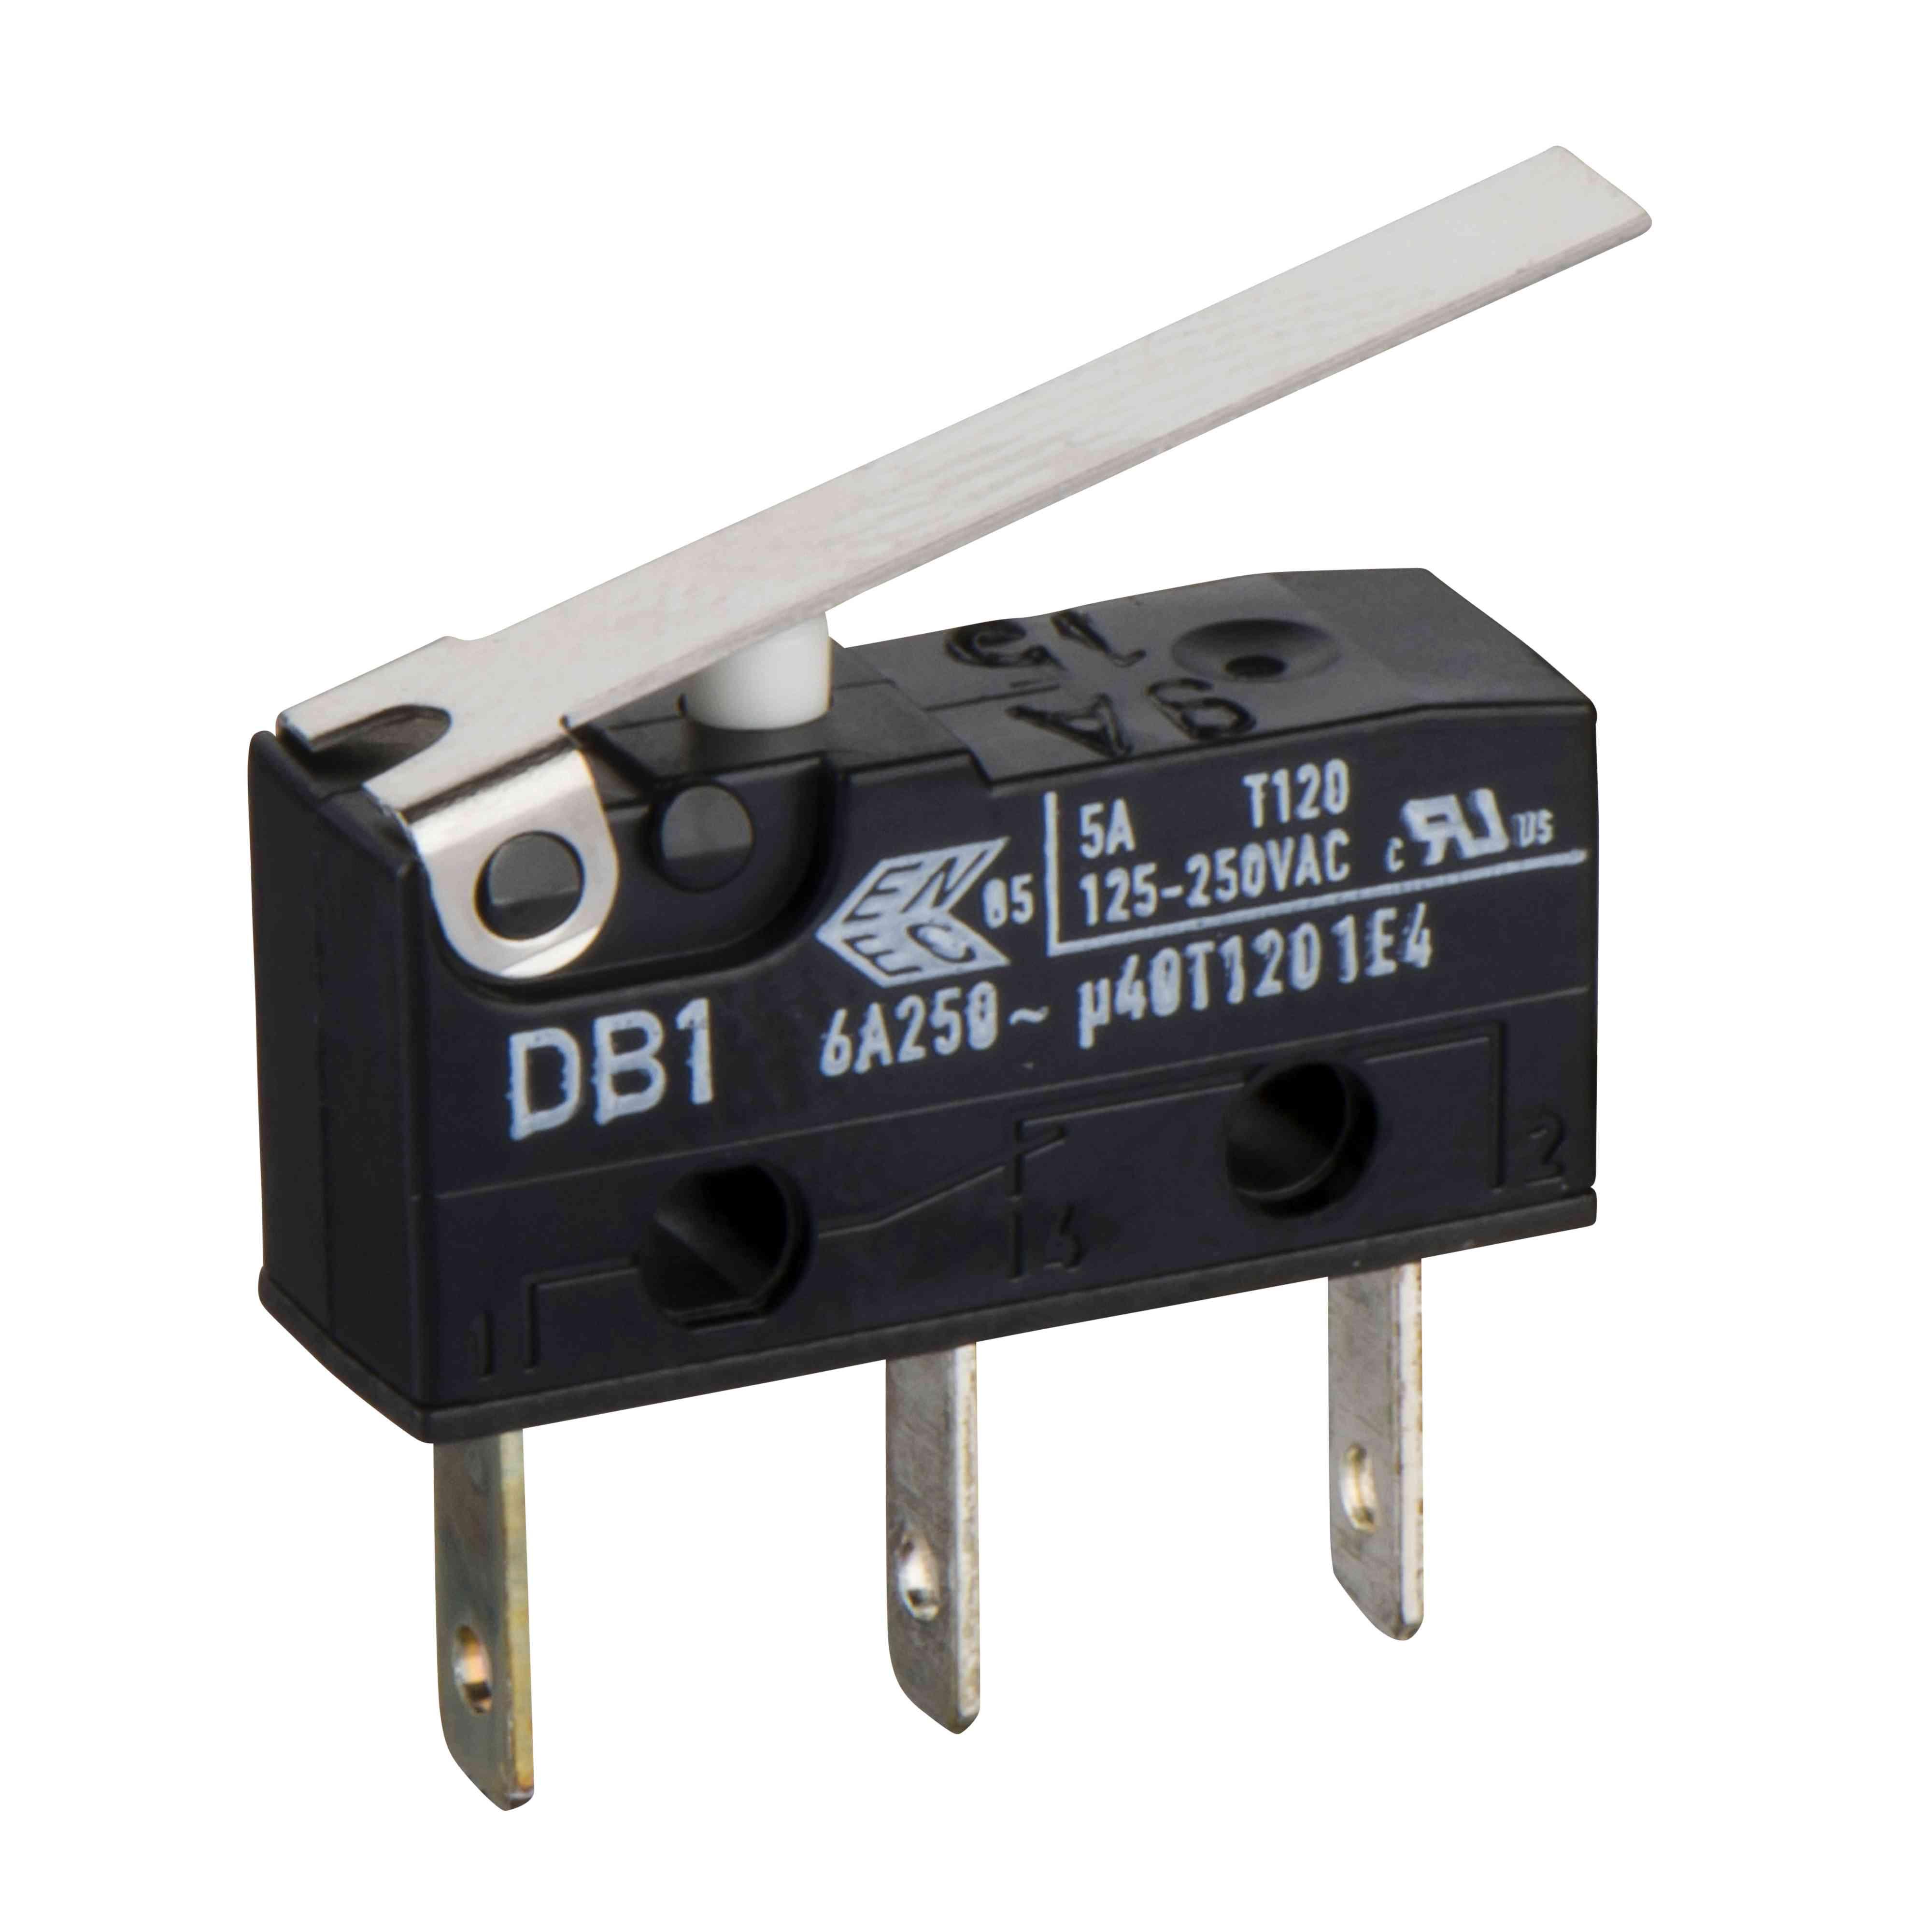 Pomožni kontakt za preklop 1 NO + 1NC standardni - za Fupact ISFT 100N